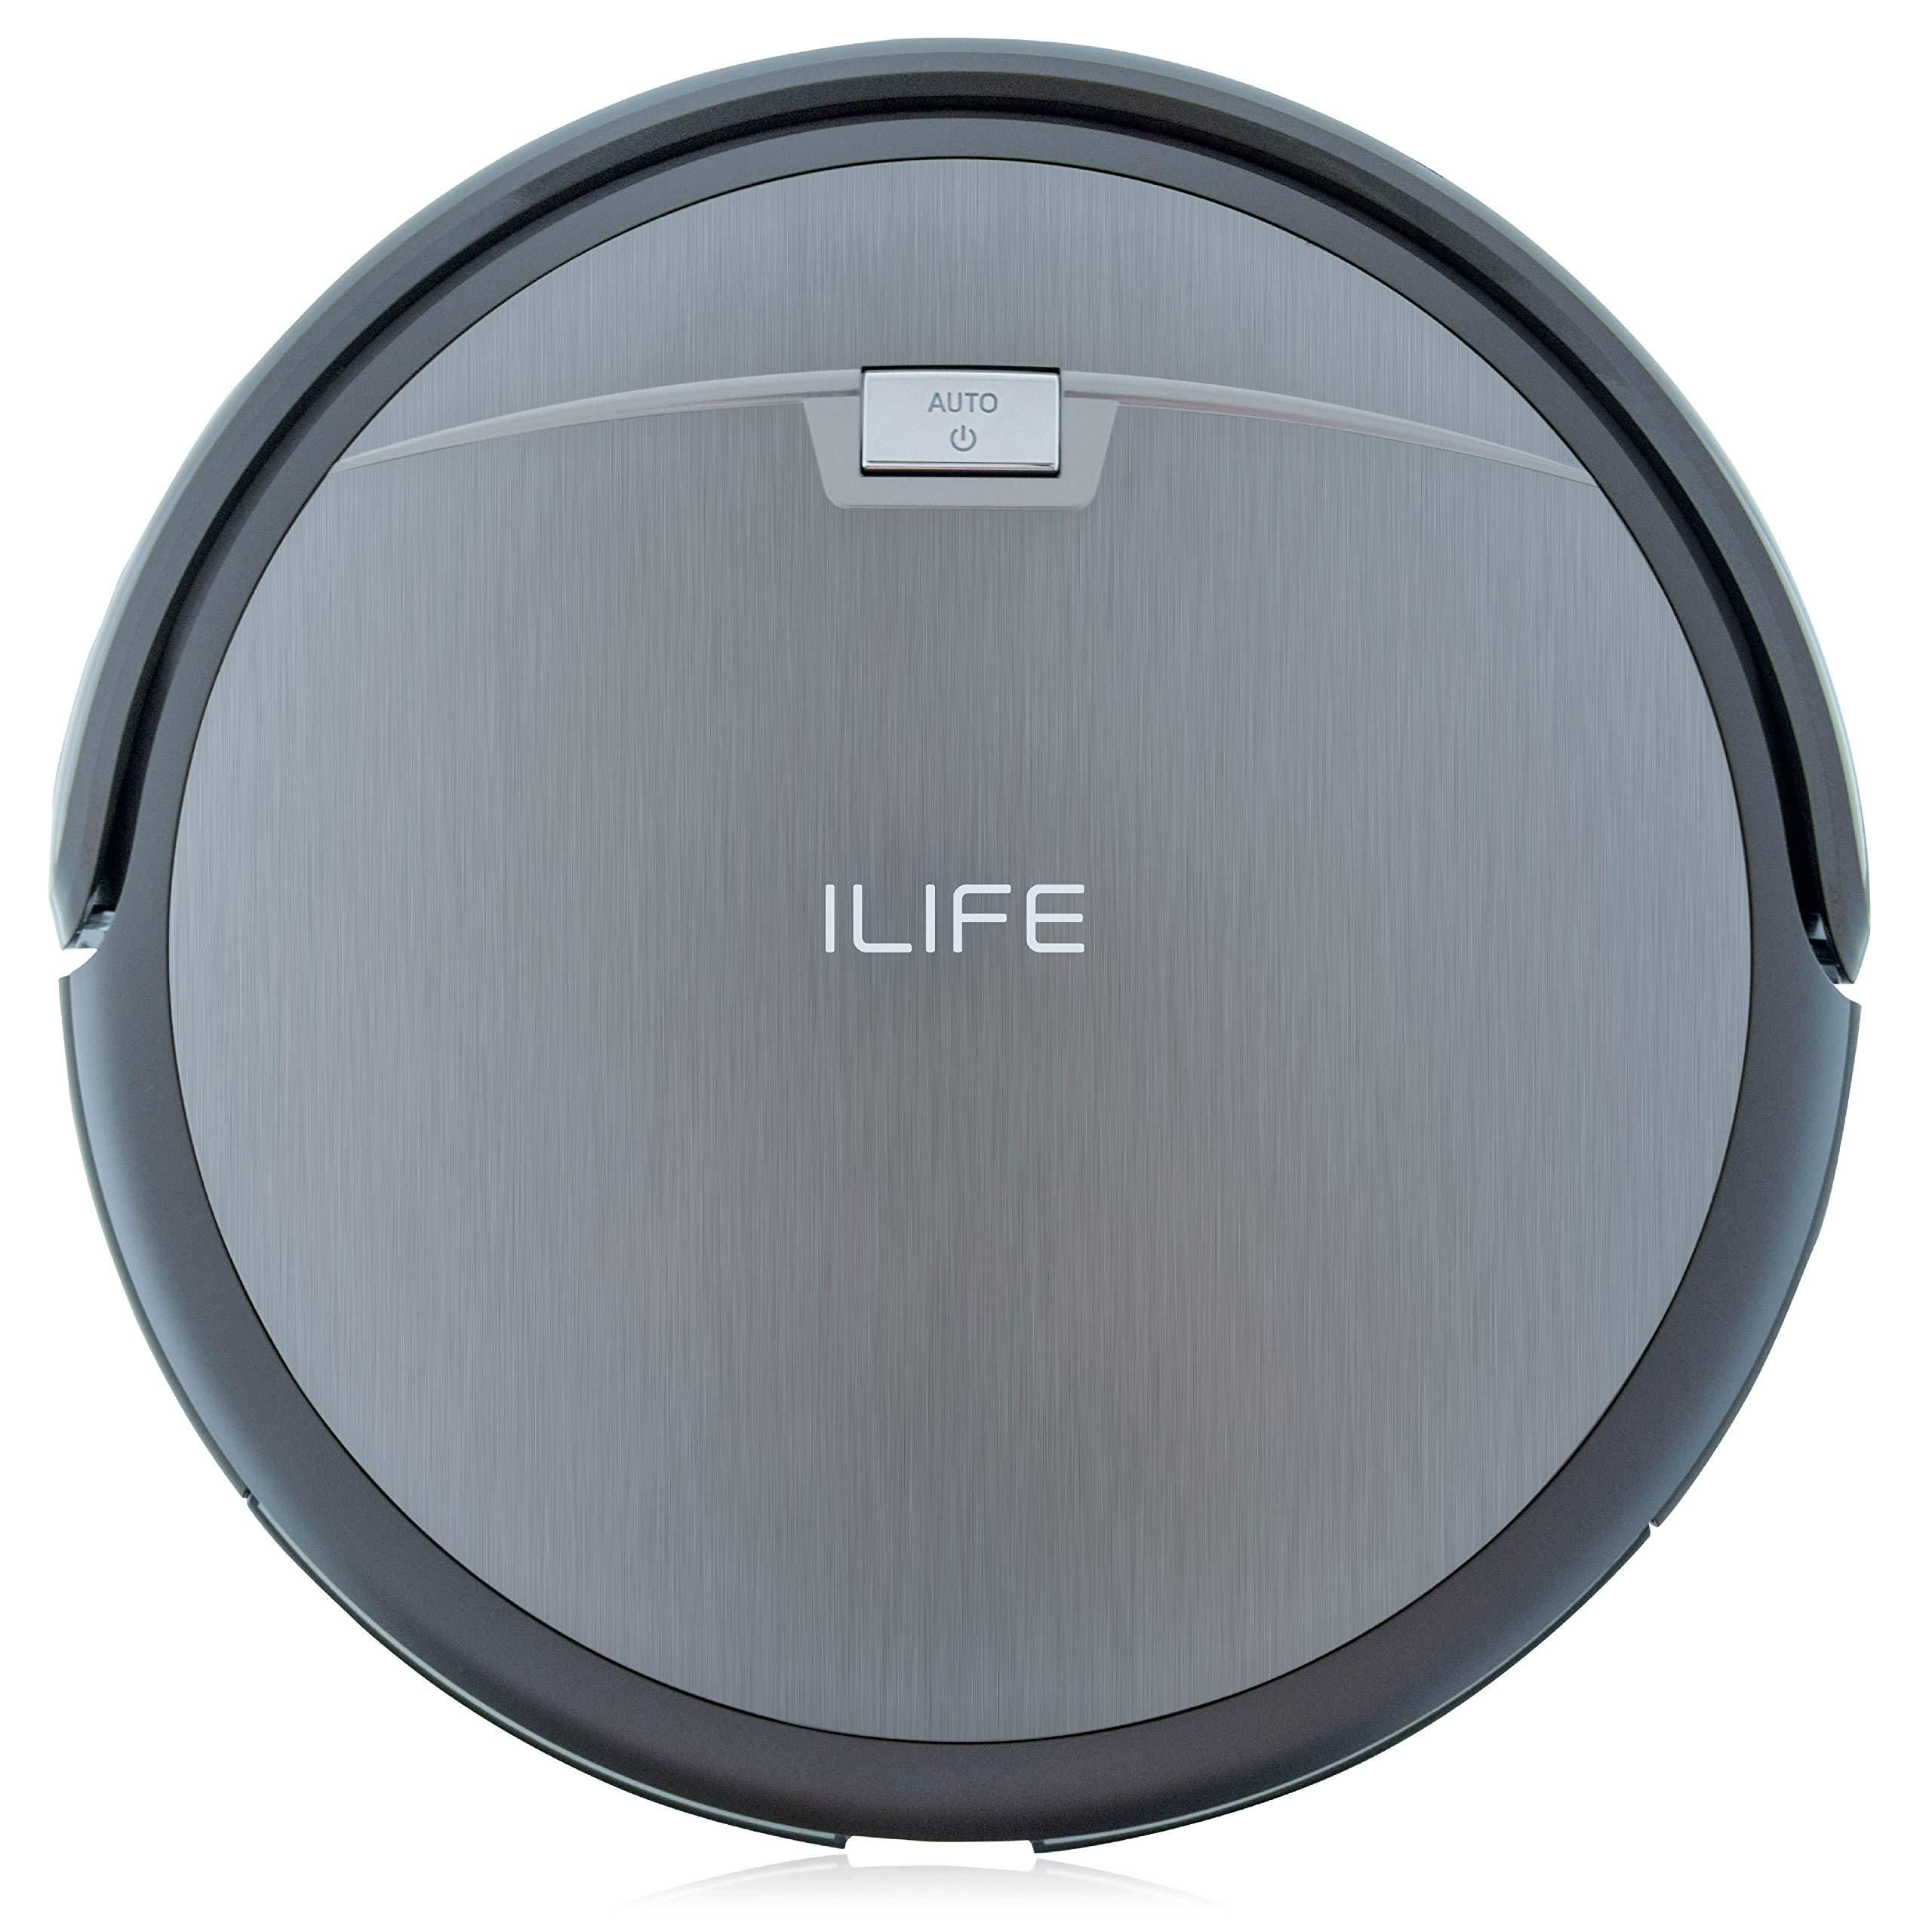 ILIFE automatischer Saugroboter